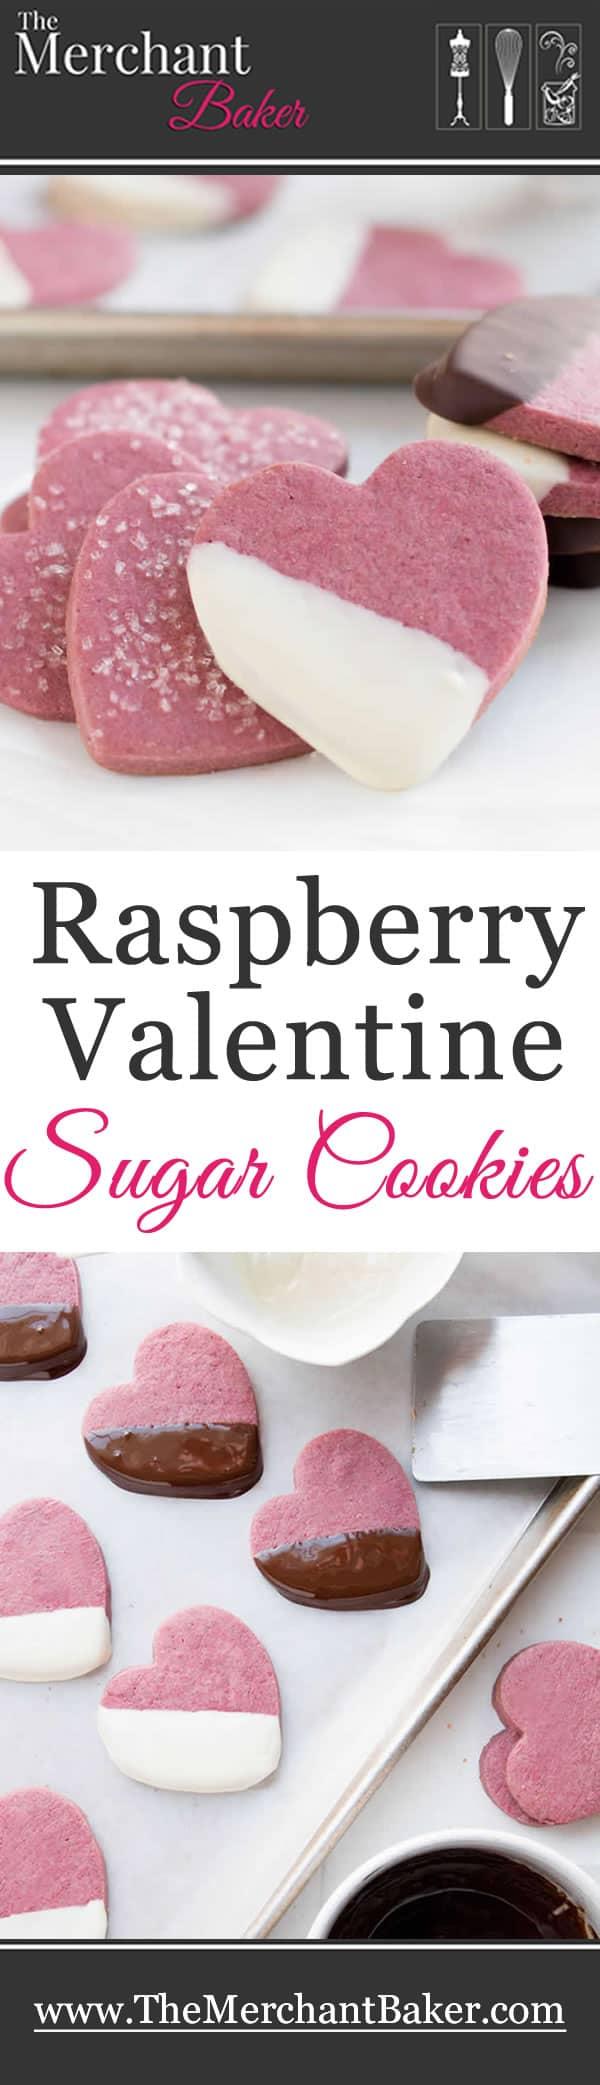 Raspberry Valentine Sugar Cookies